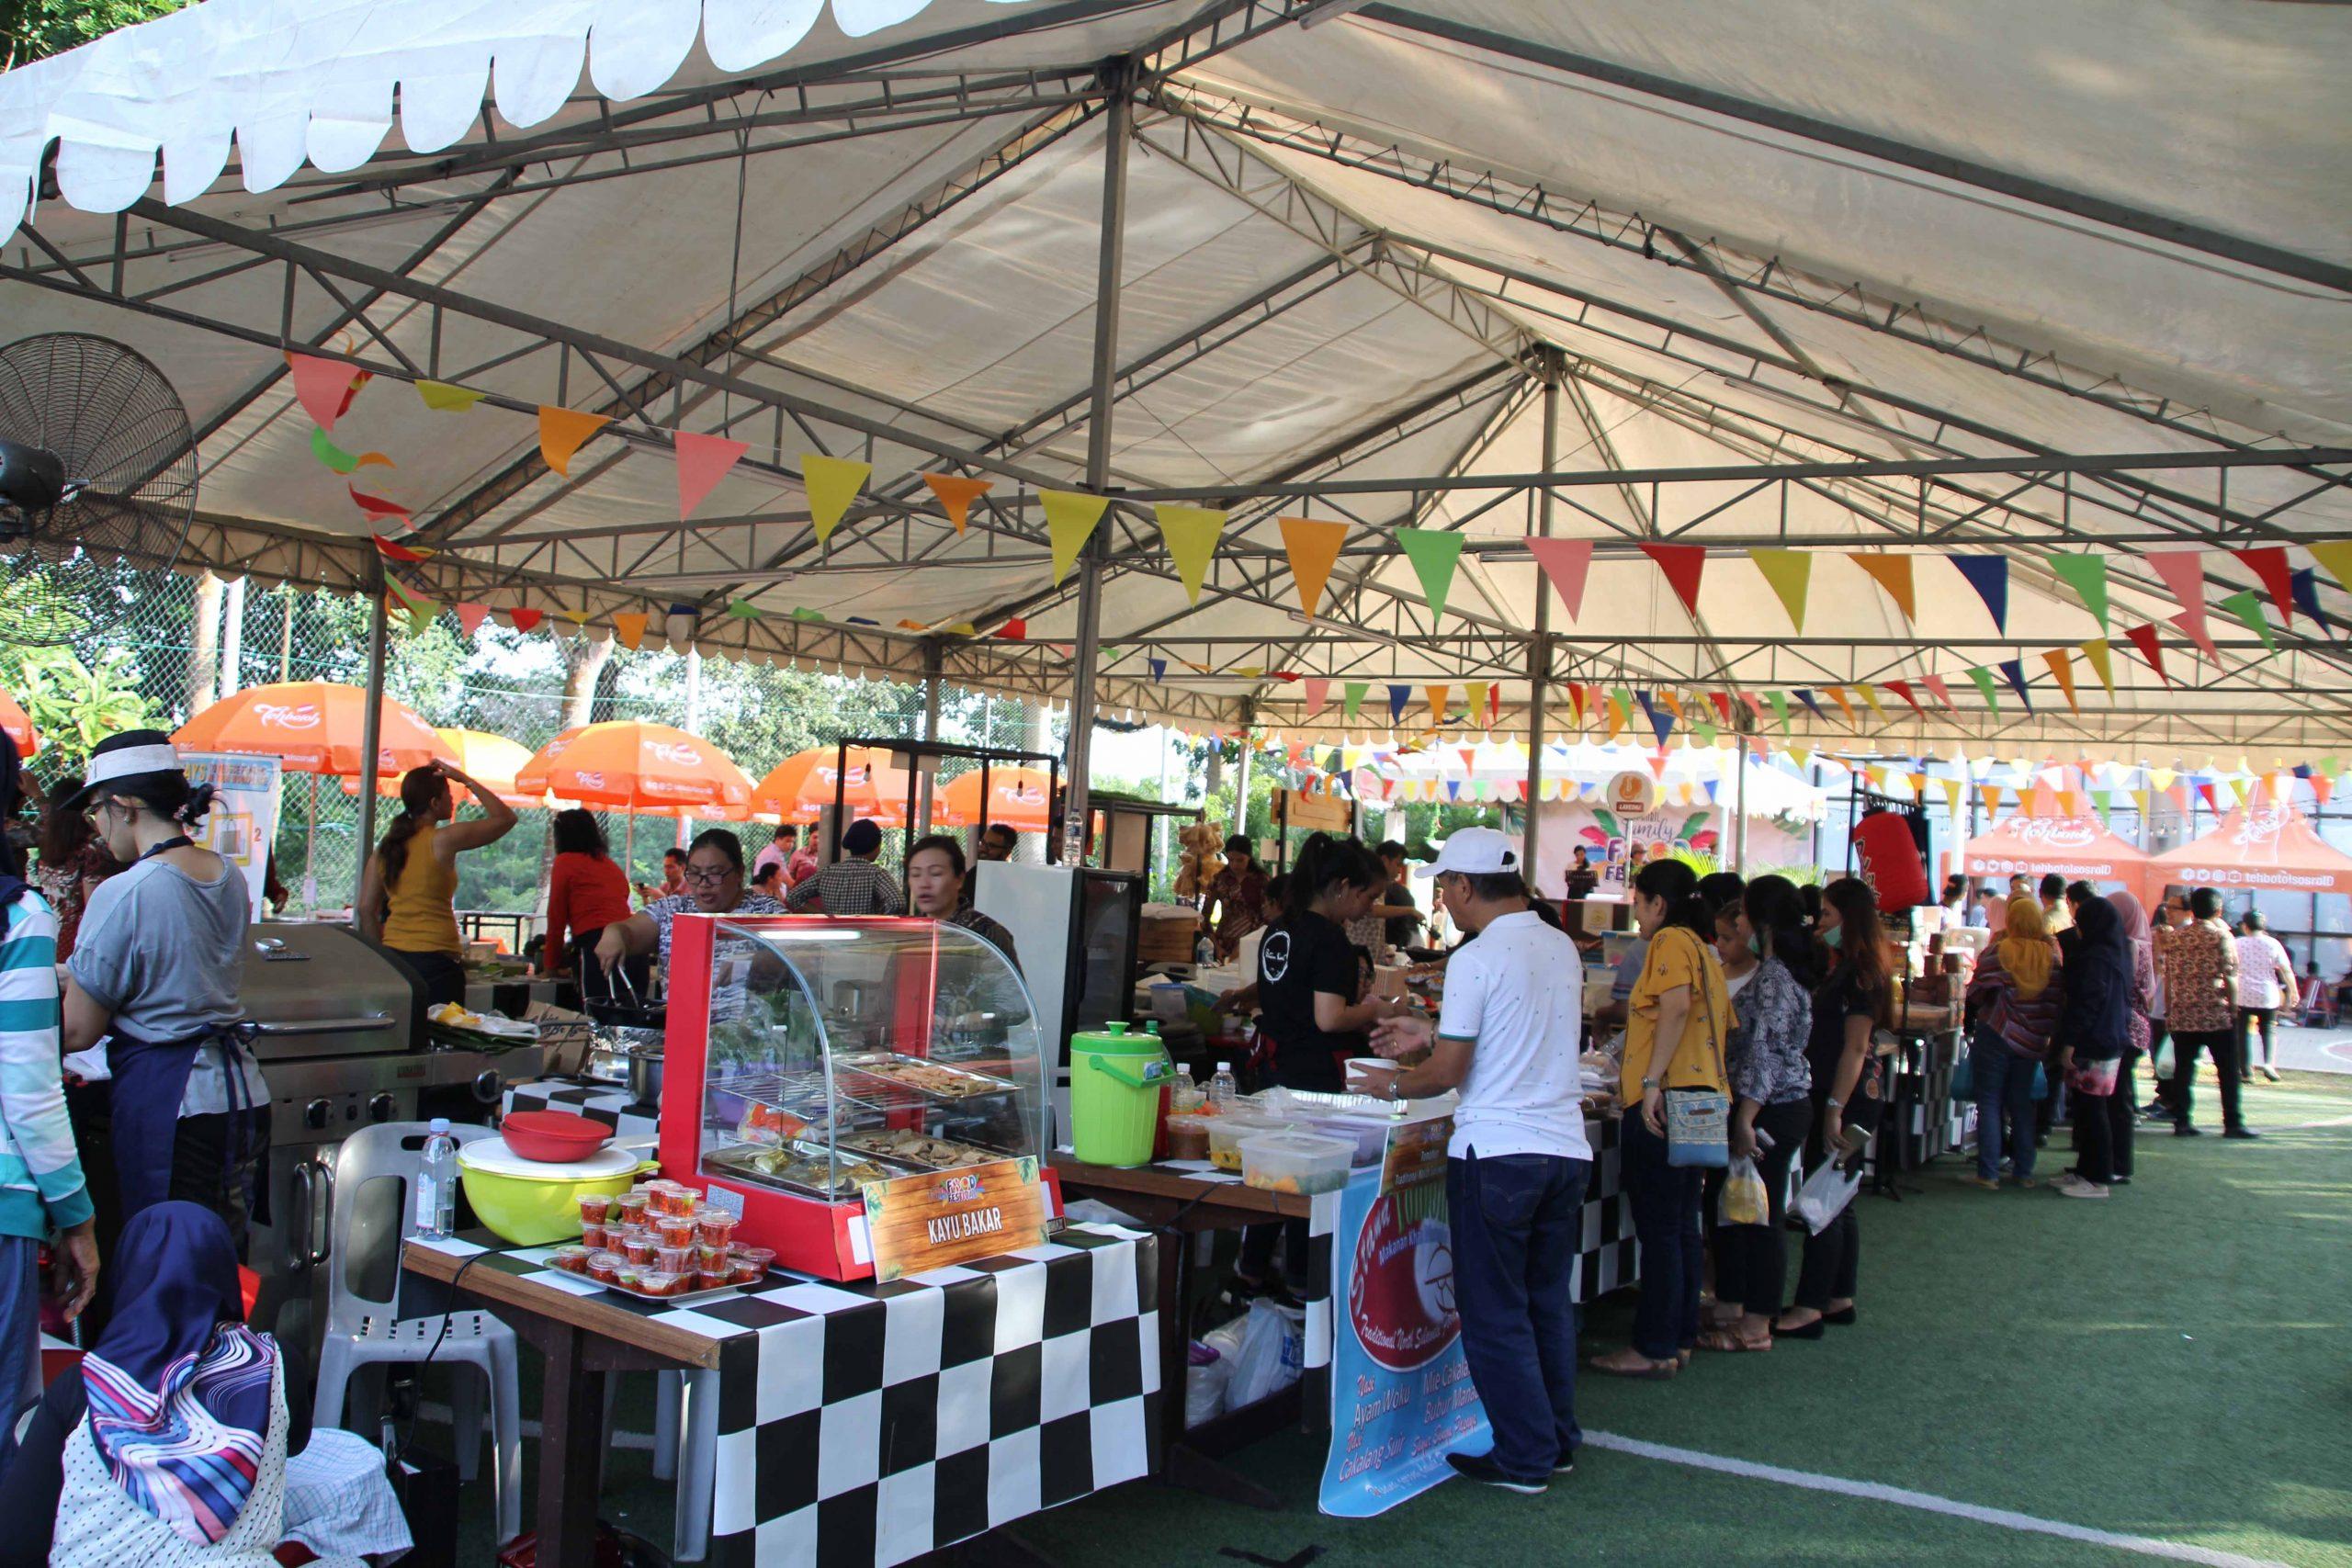 PANBIL FAMILY FOOD FESTIVAL